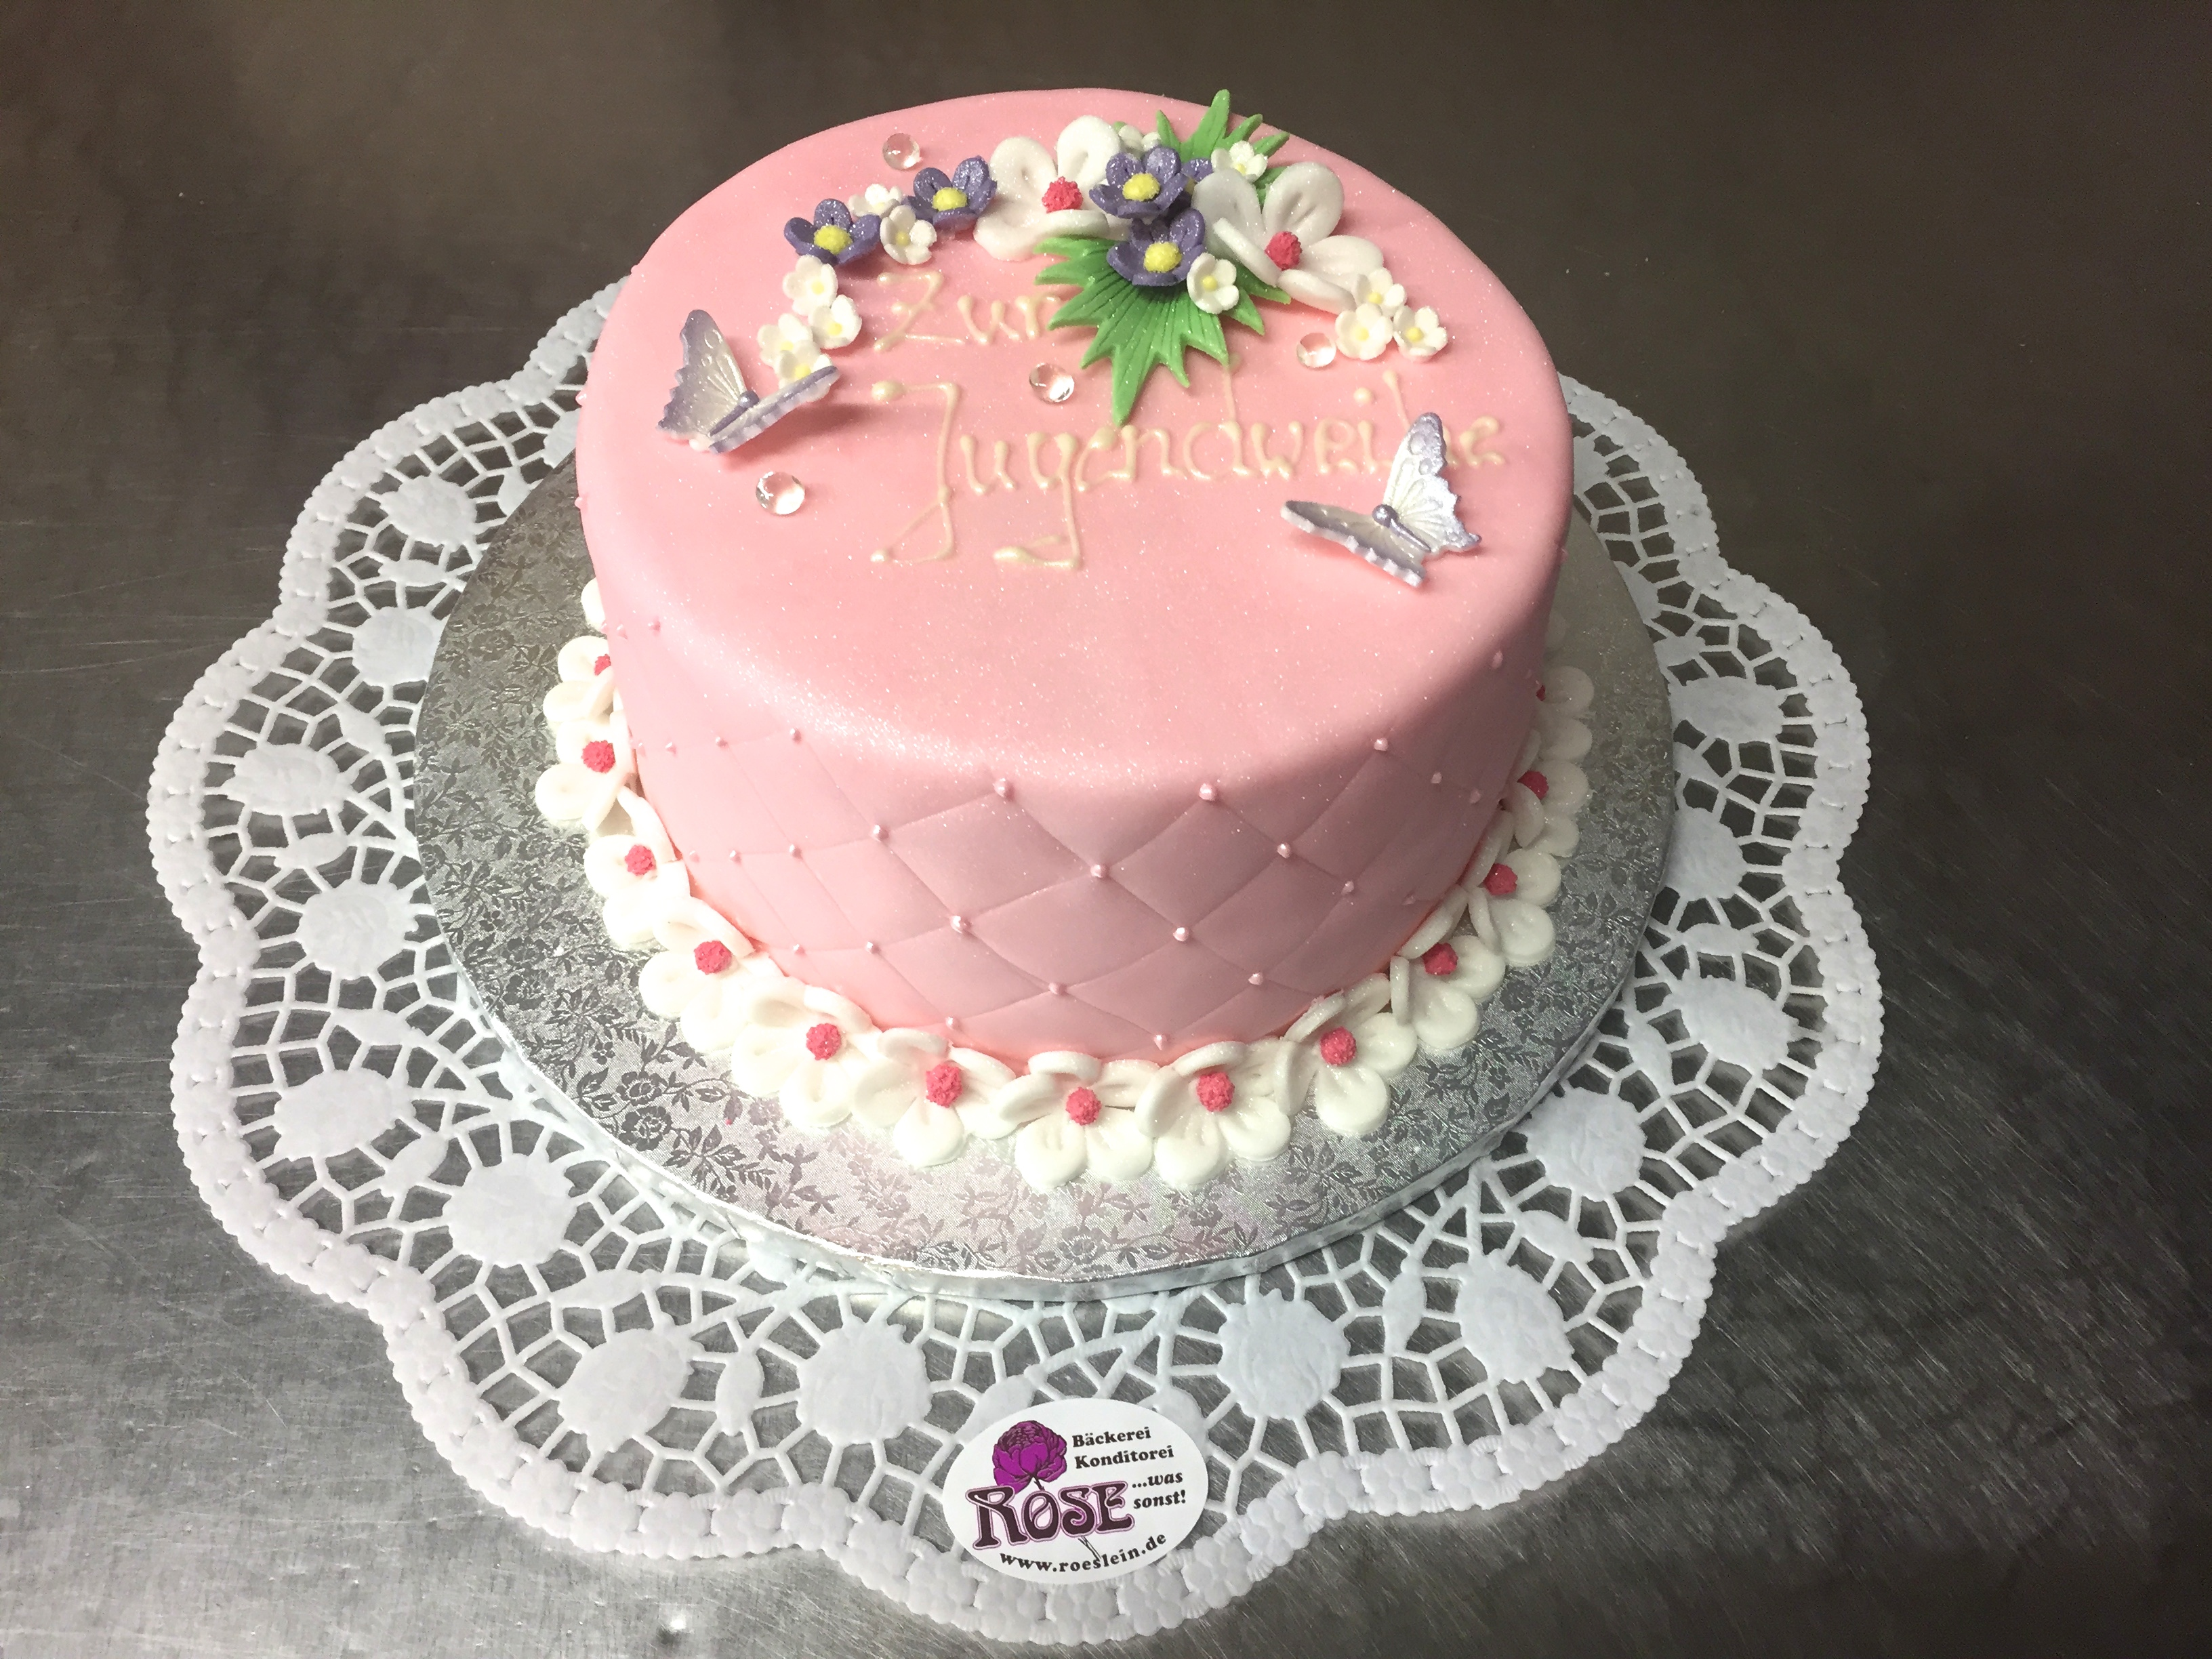 Geurbtstagstorte Bäckerei Rose Weimar